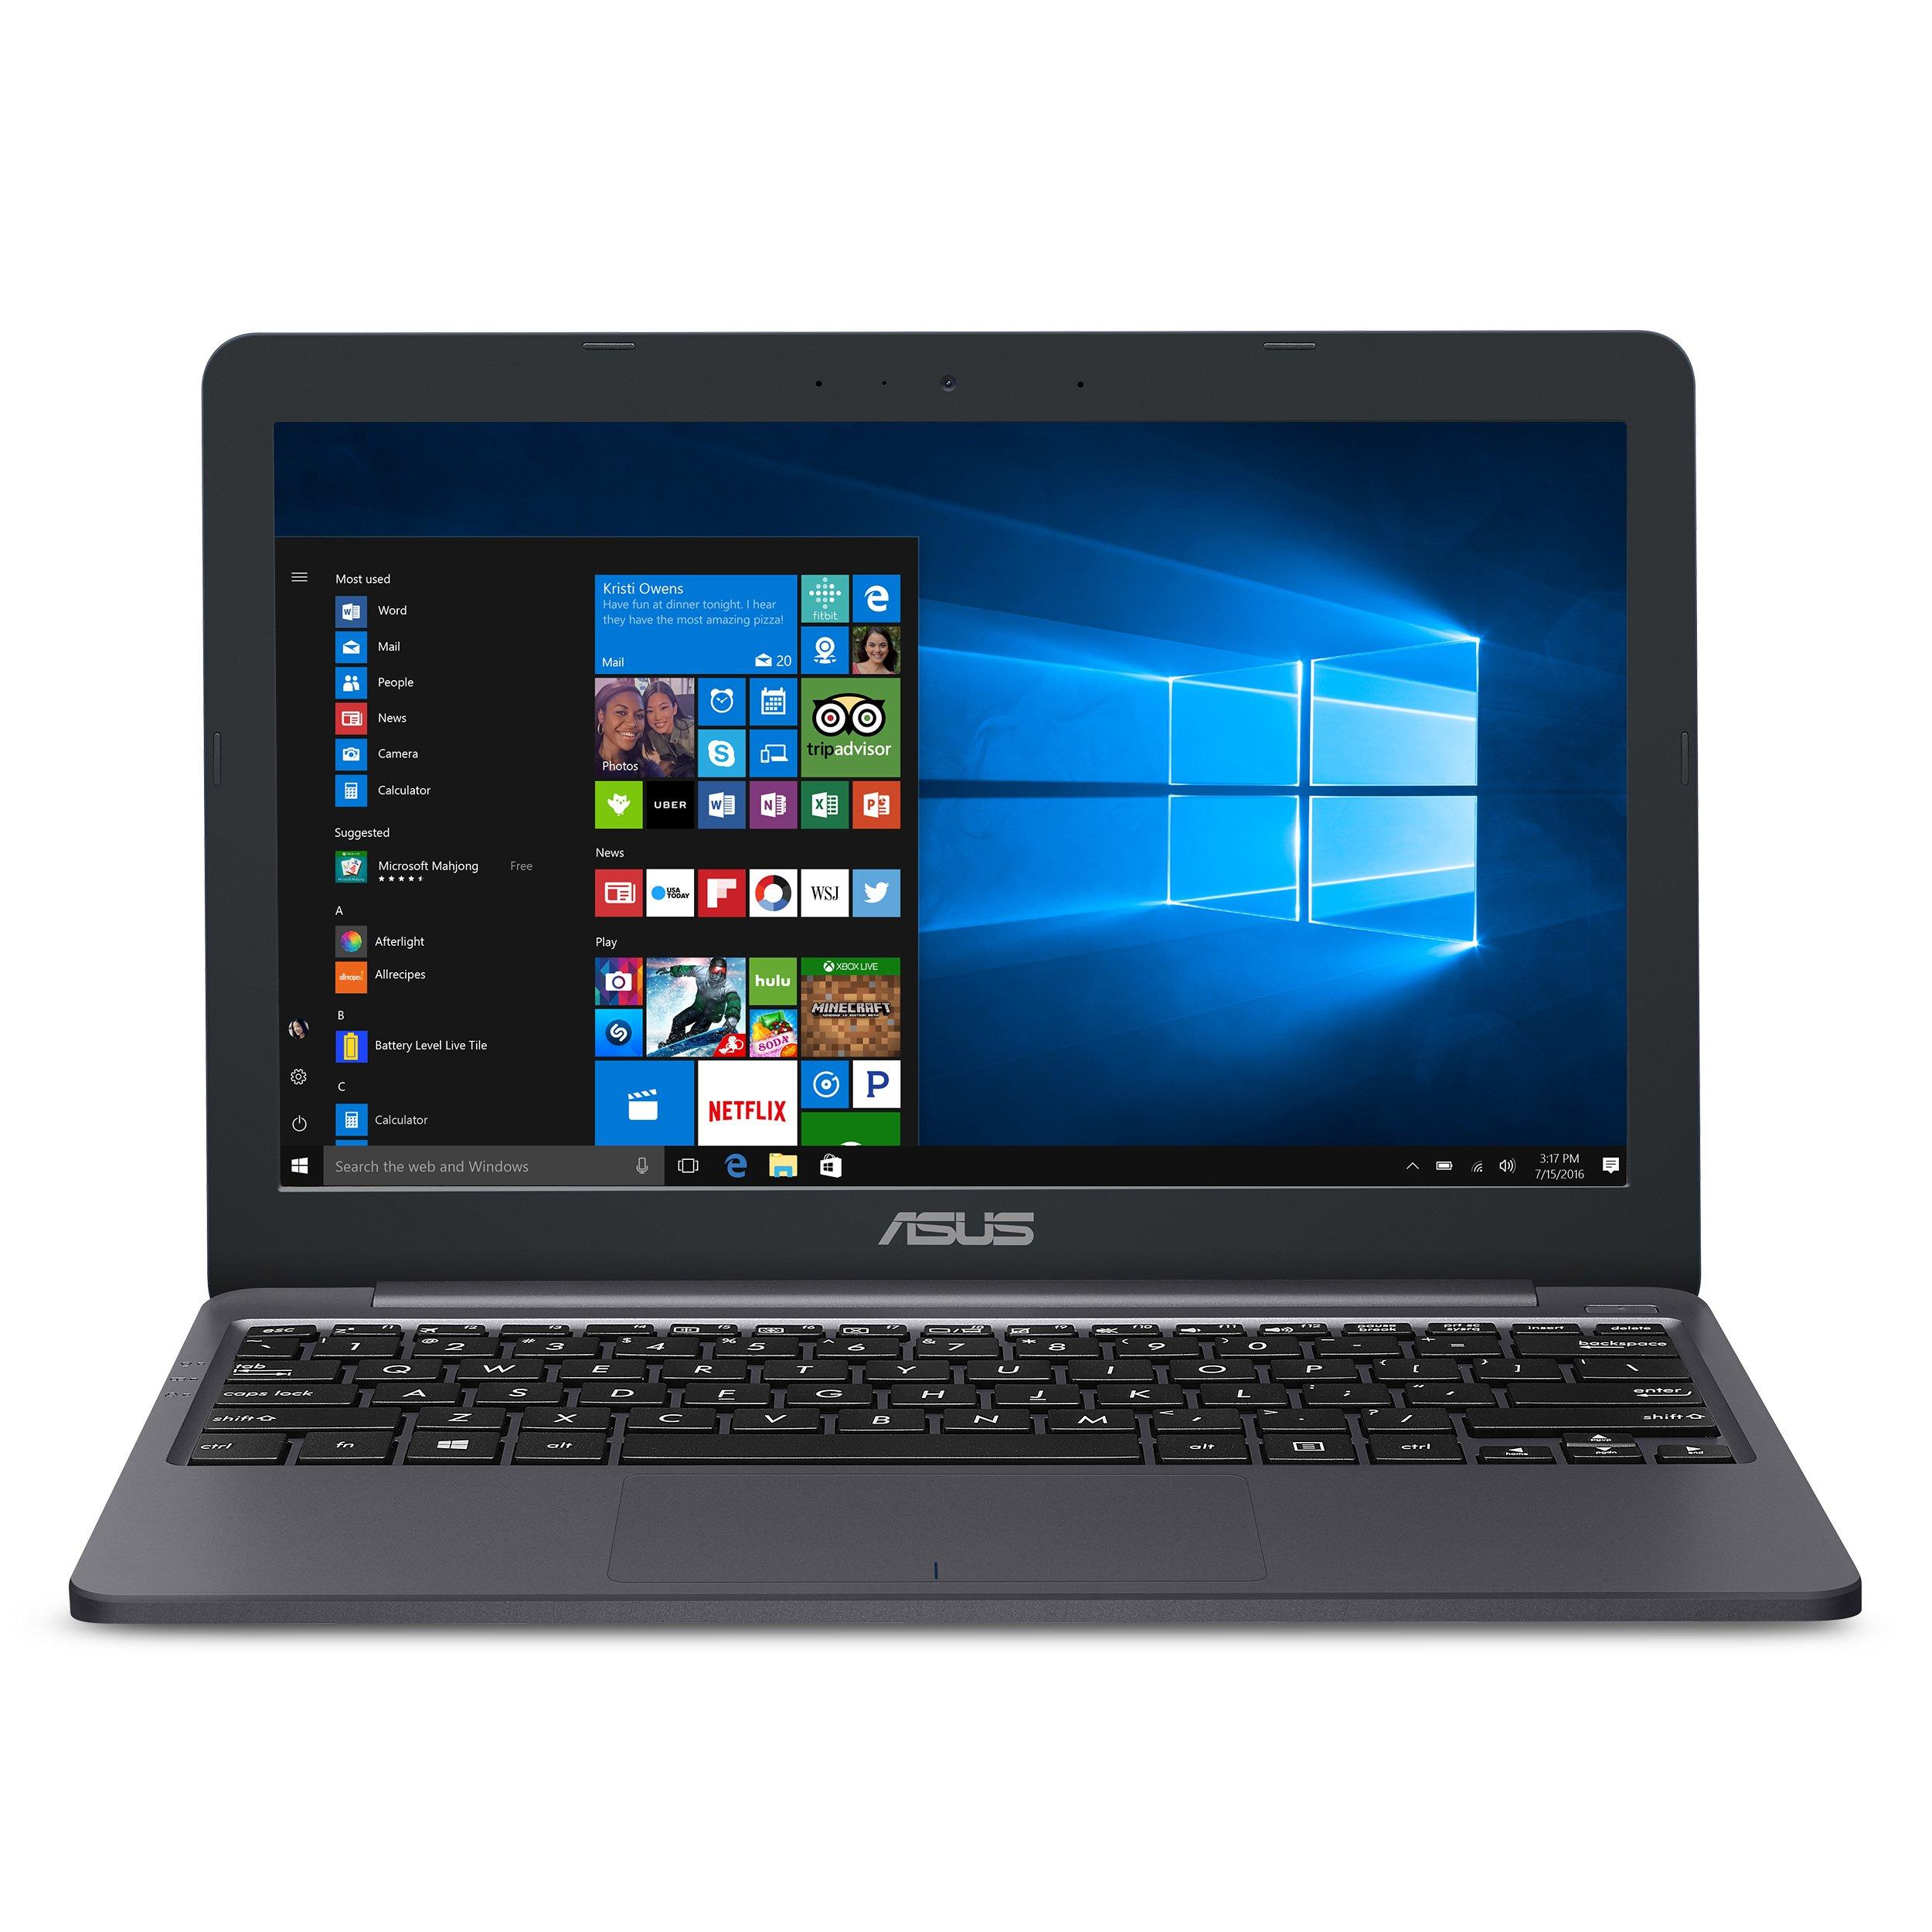 ASUS VivoBook L203MA Ultra-Thin Laptop, Intel Celeron N4000 Processor, 4GB RAM, 64GB eMMC storage, 11.6'' HD, USB-C, Wi-Fi 5, Windows 10, L203MA-DS04, One Year of Microsoft Office 365 by ASUS